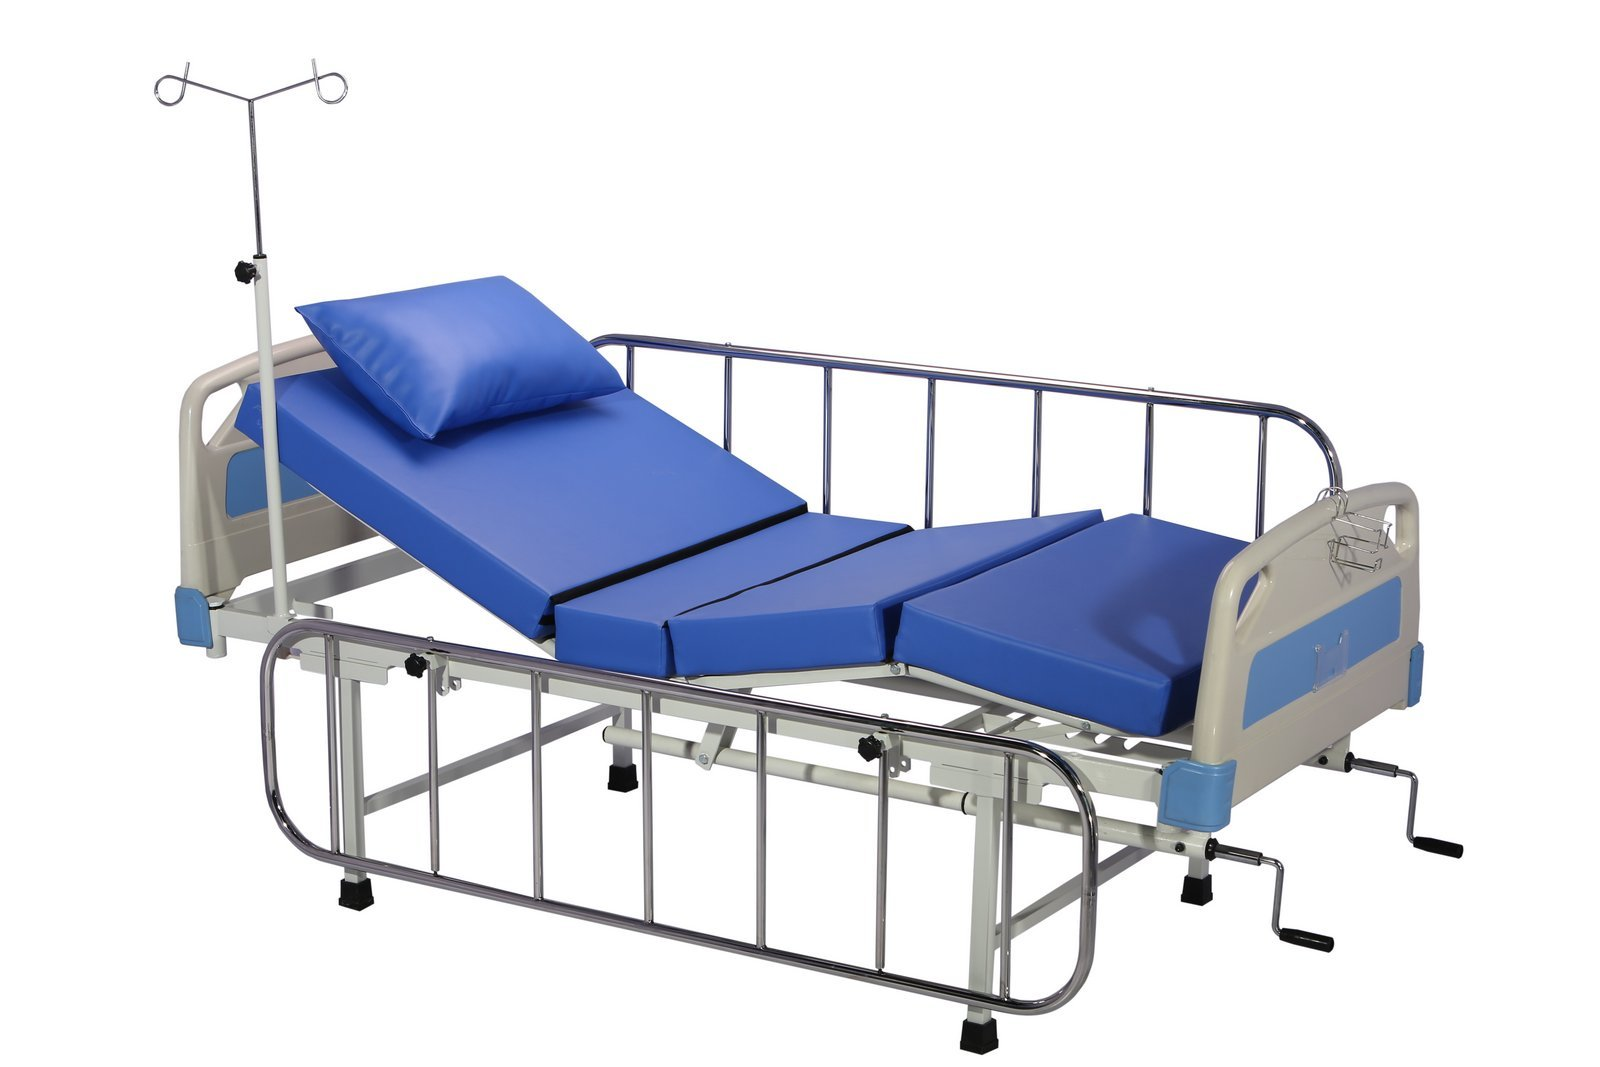 SEMIFOWLER BED